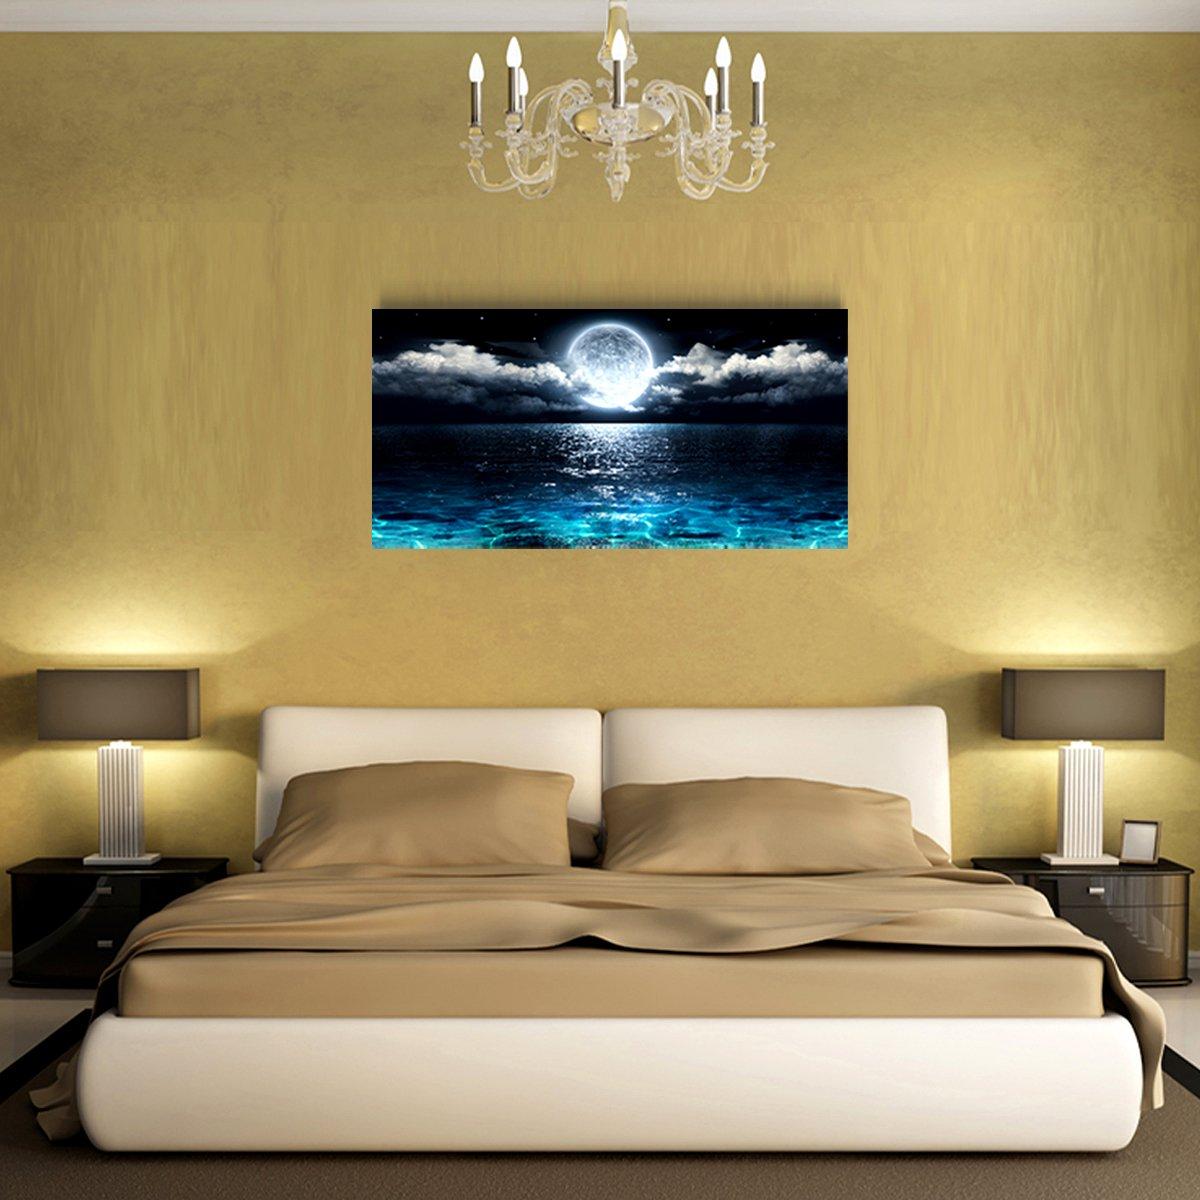 Amazon.com: Wall Art Moon Sea Ocean Landscape Picture Canvas Wall ...